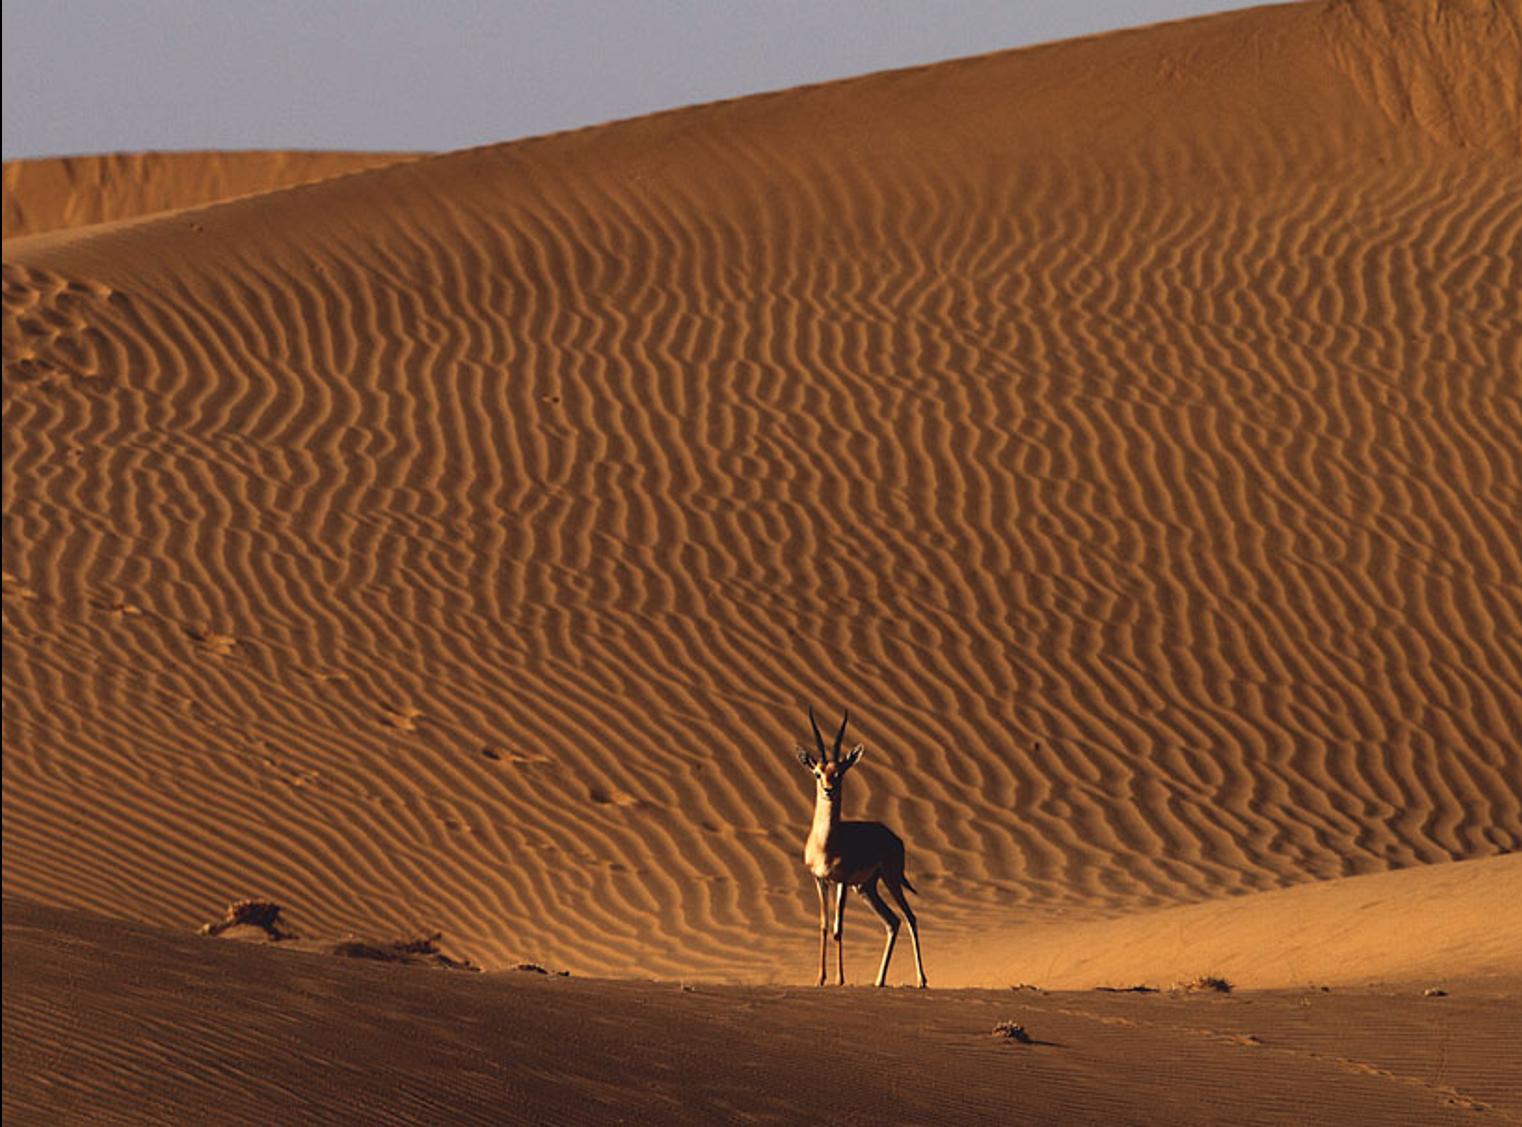 Alert chinkara on a sand dune. Photo by Gobind Sagar Bhardwaj.